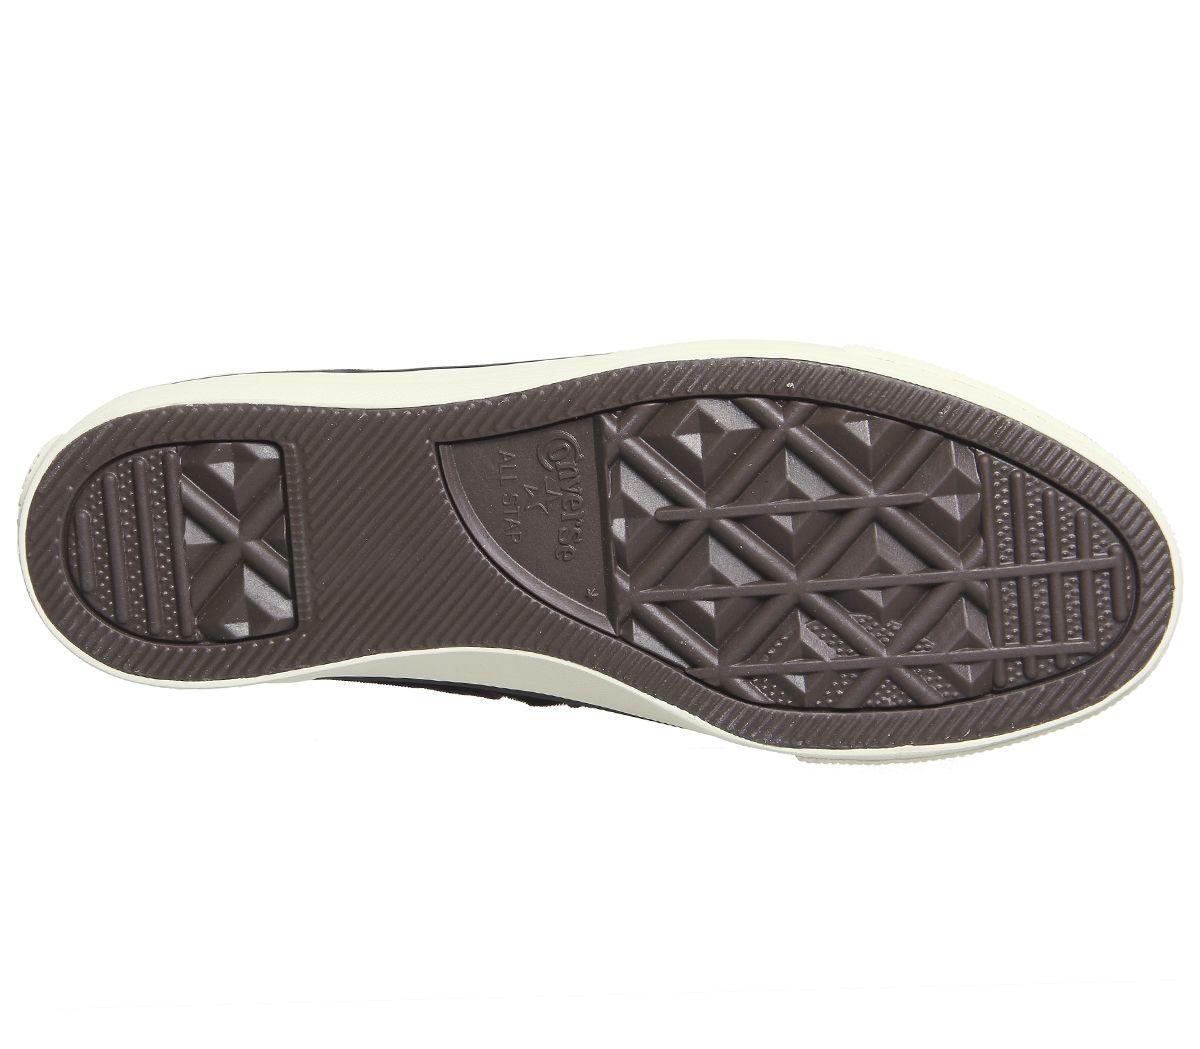 Womens-Converse-One-Star-Platforms-Dark-Sangria-Egret-Velvet-Trainers-Shoes thumbnail 6